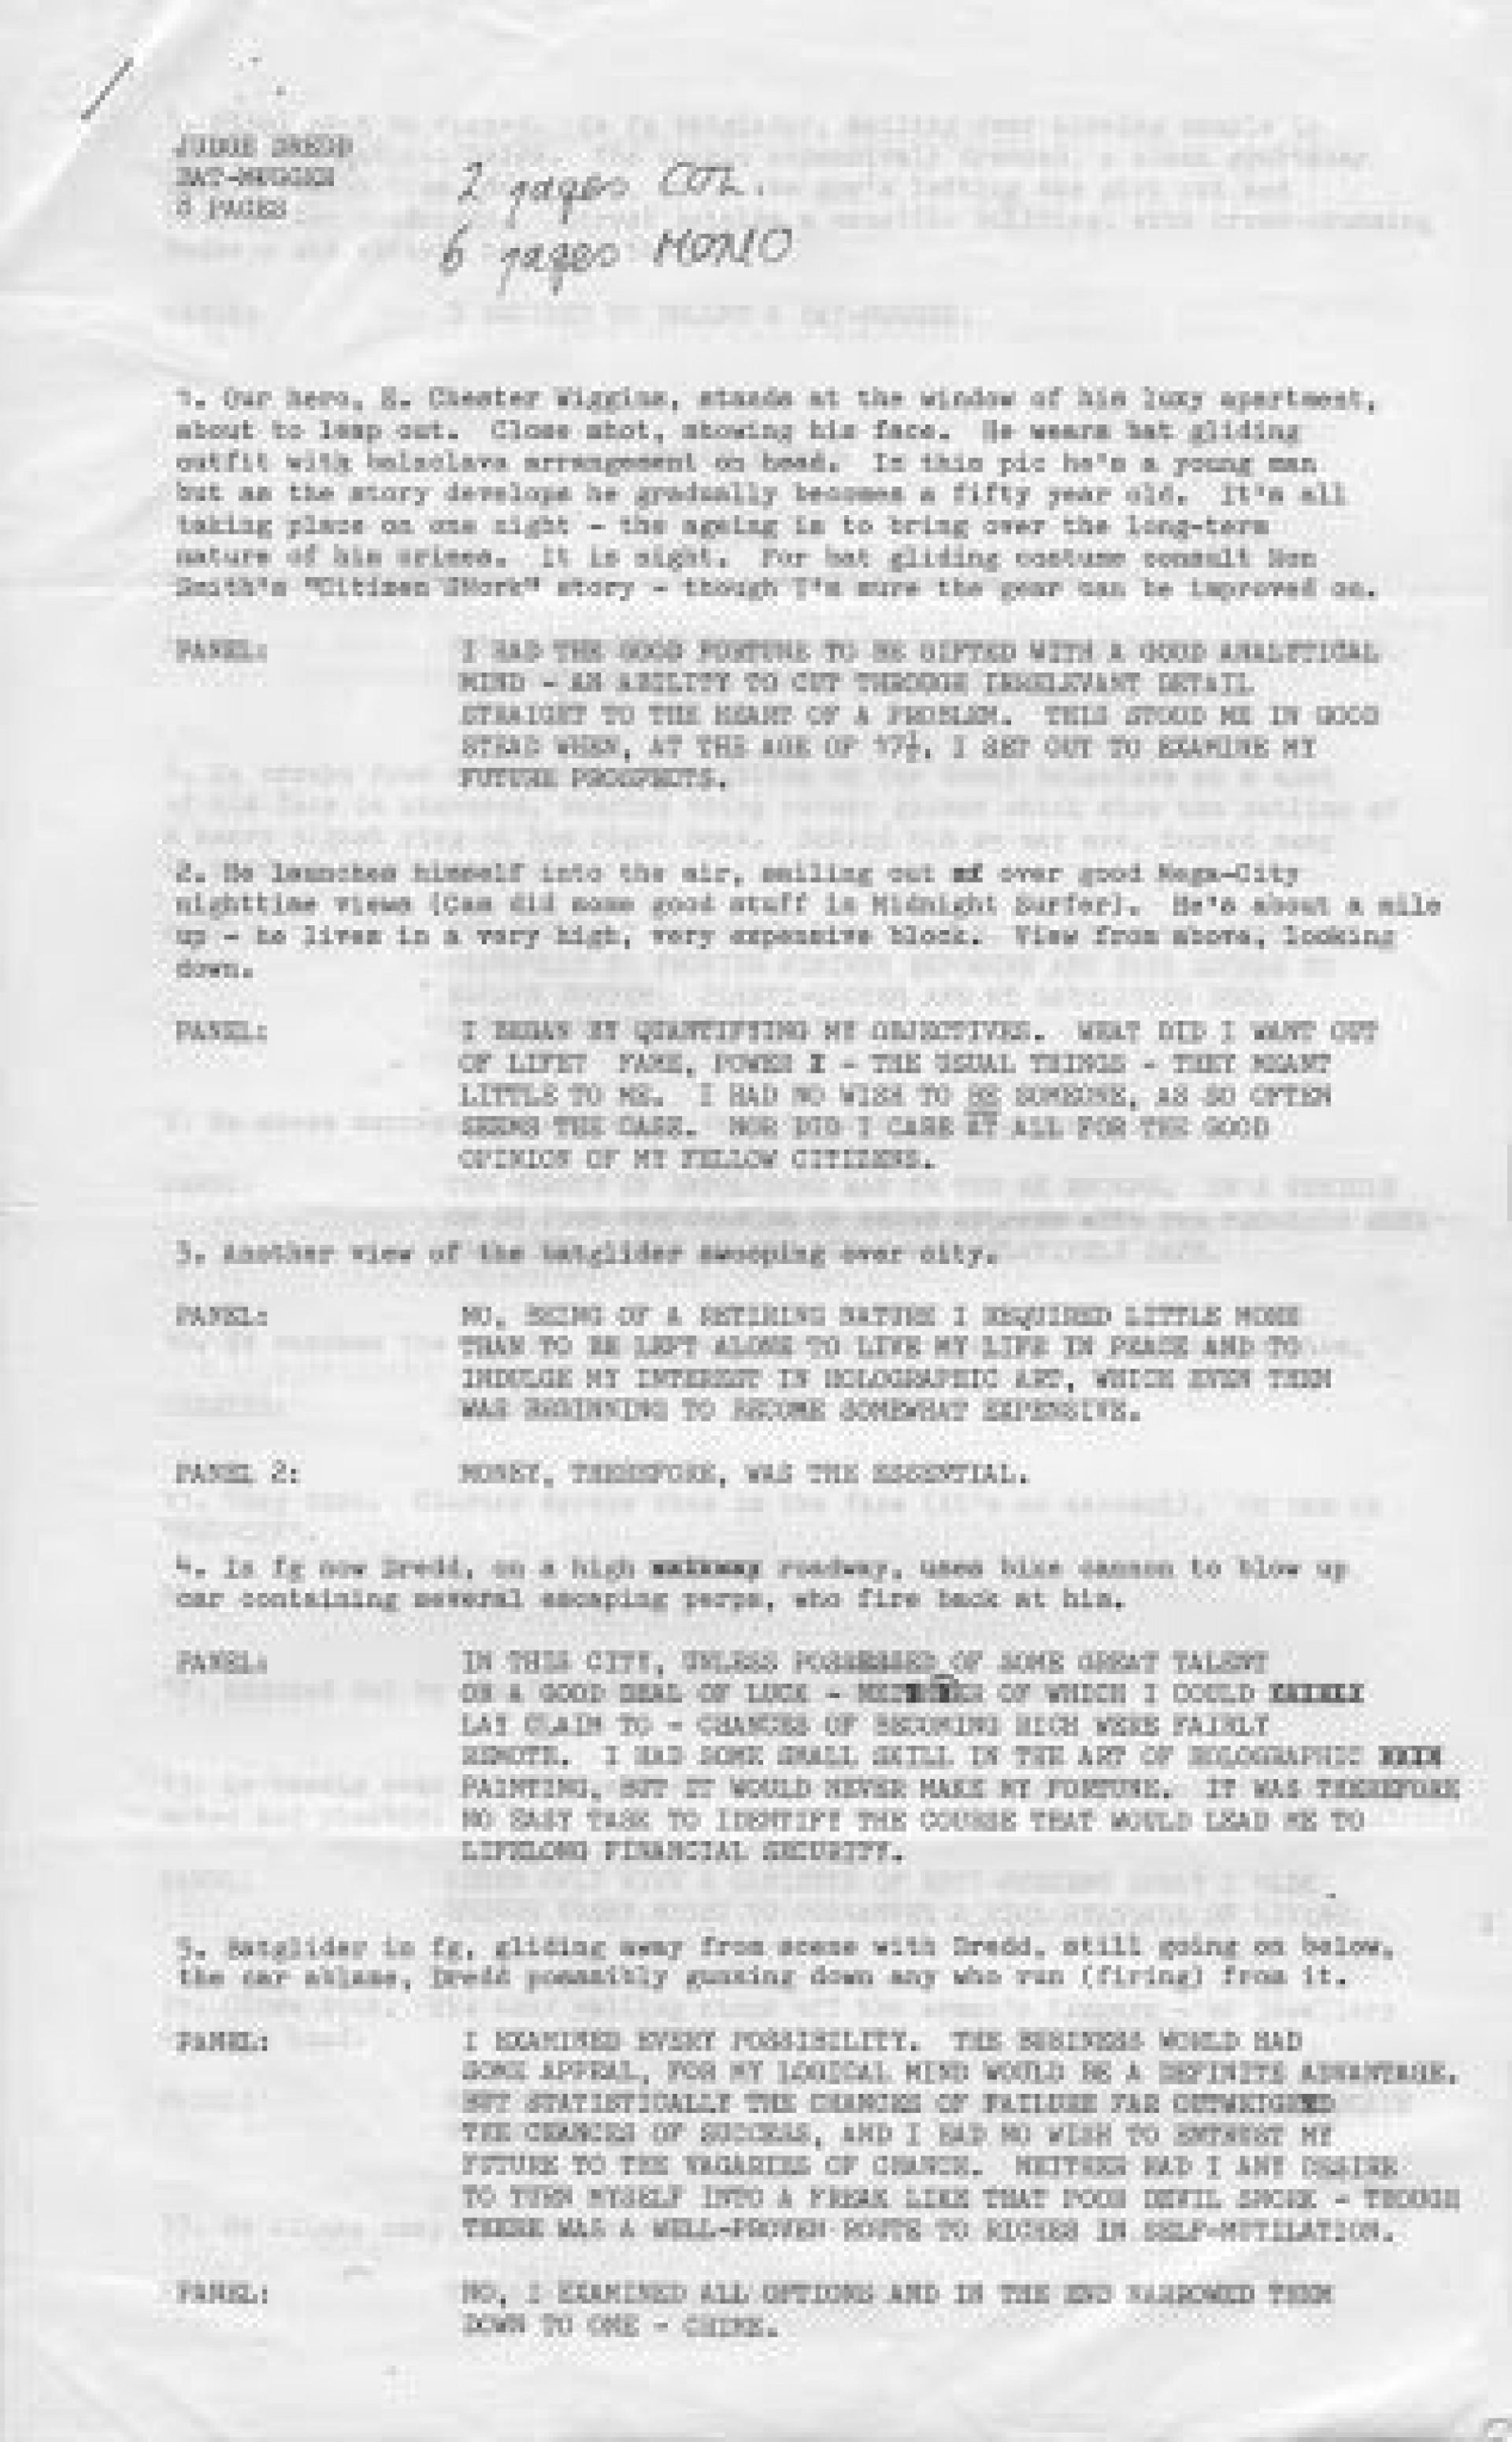 008 Remarkable Comic Book Script Sample Highest Clarity  Marvel Celtx1920